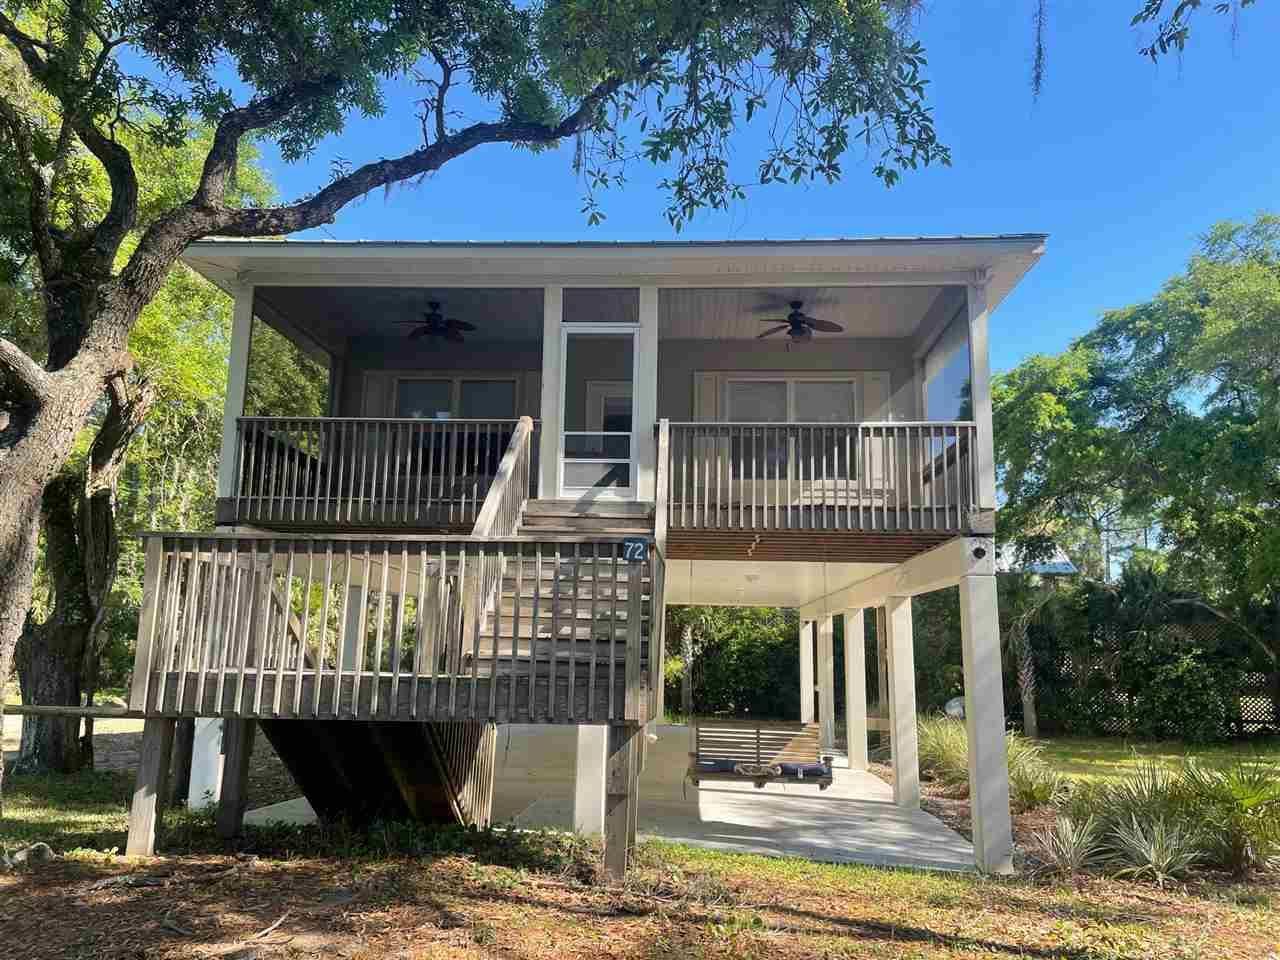 70 Driftwood Drive, Panacea, FL 32346 - MLS#: 335402